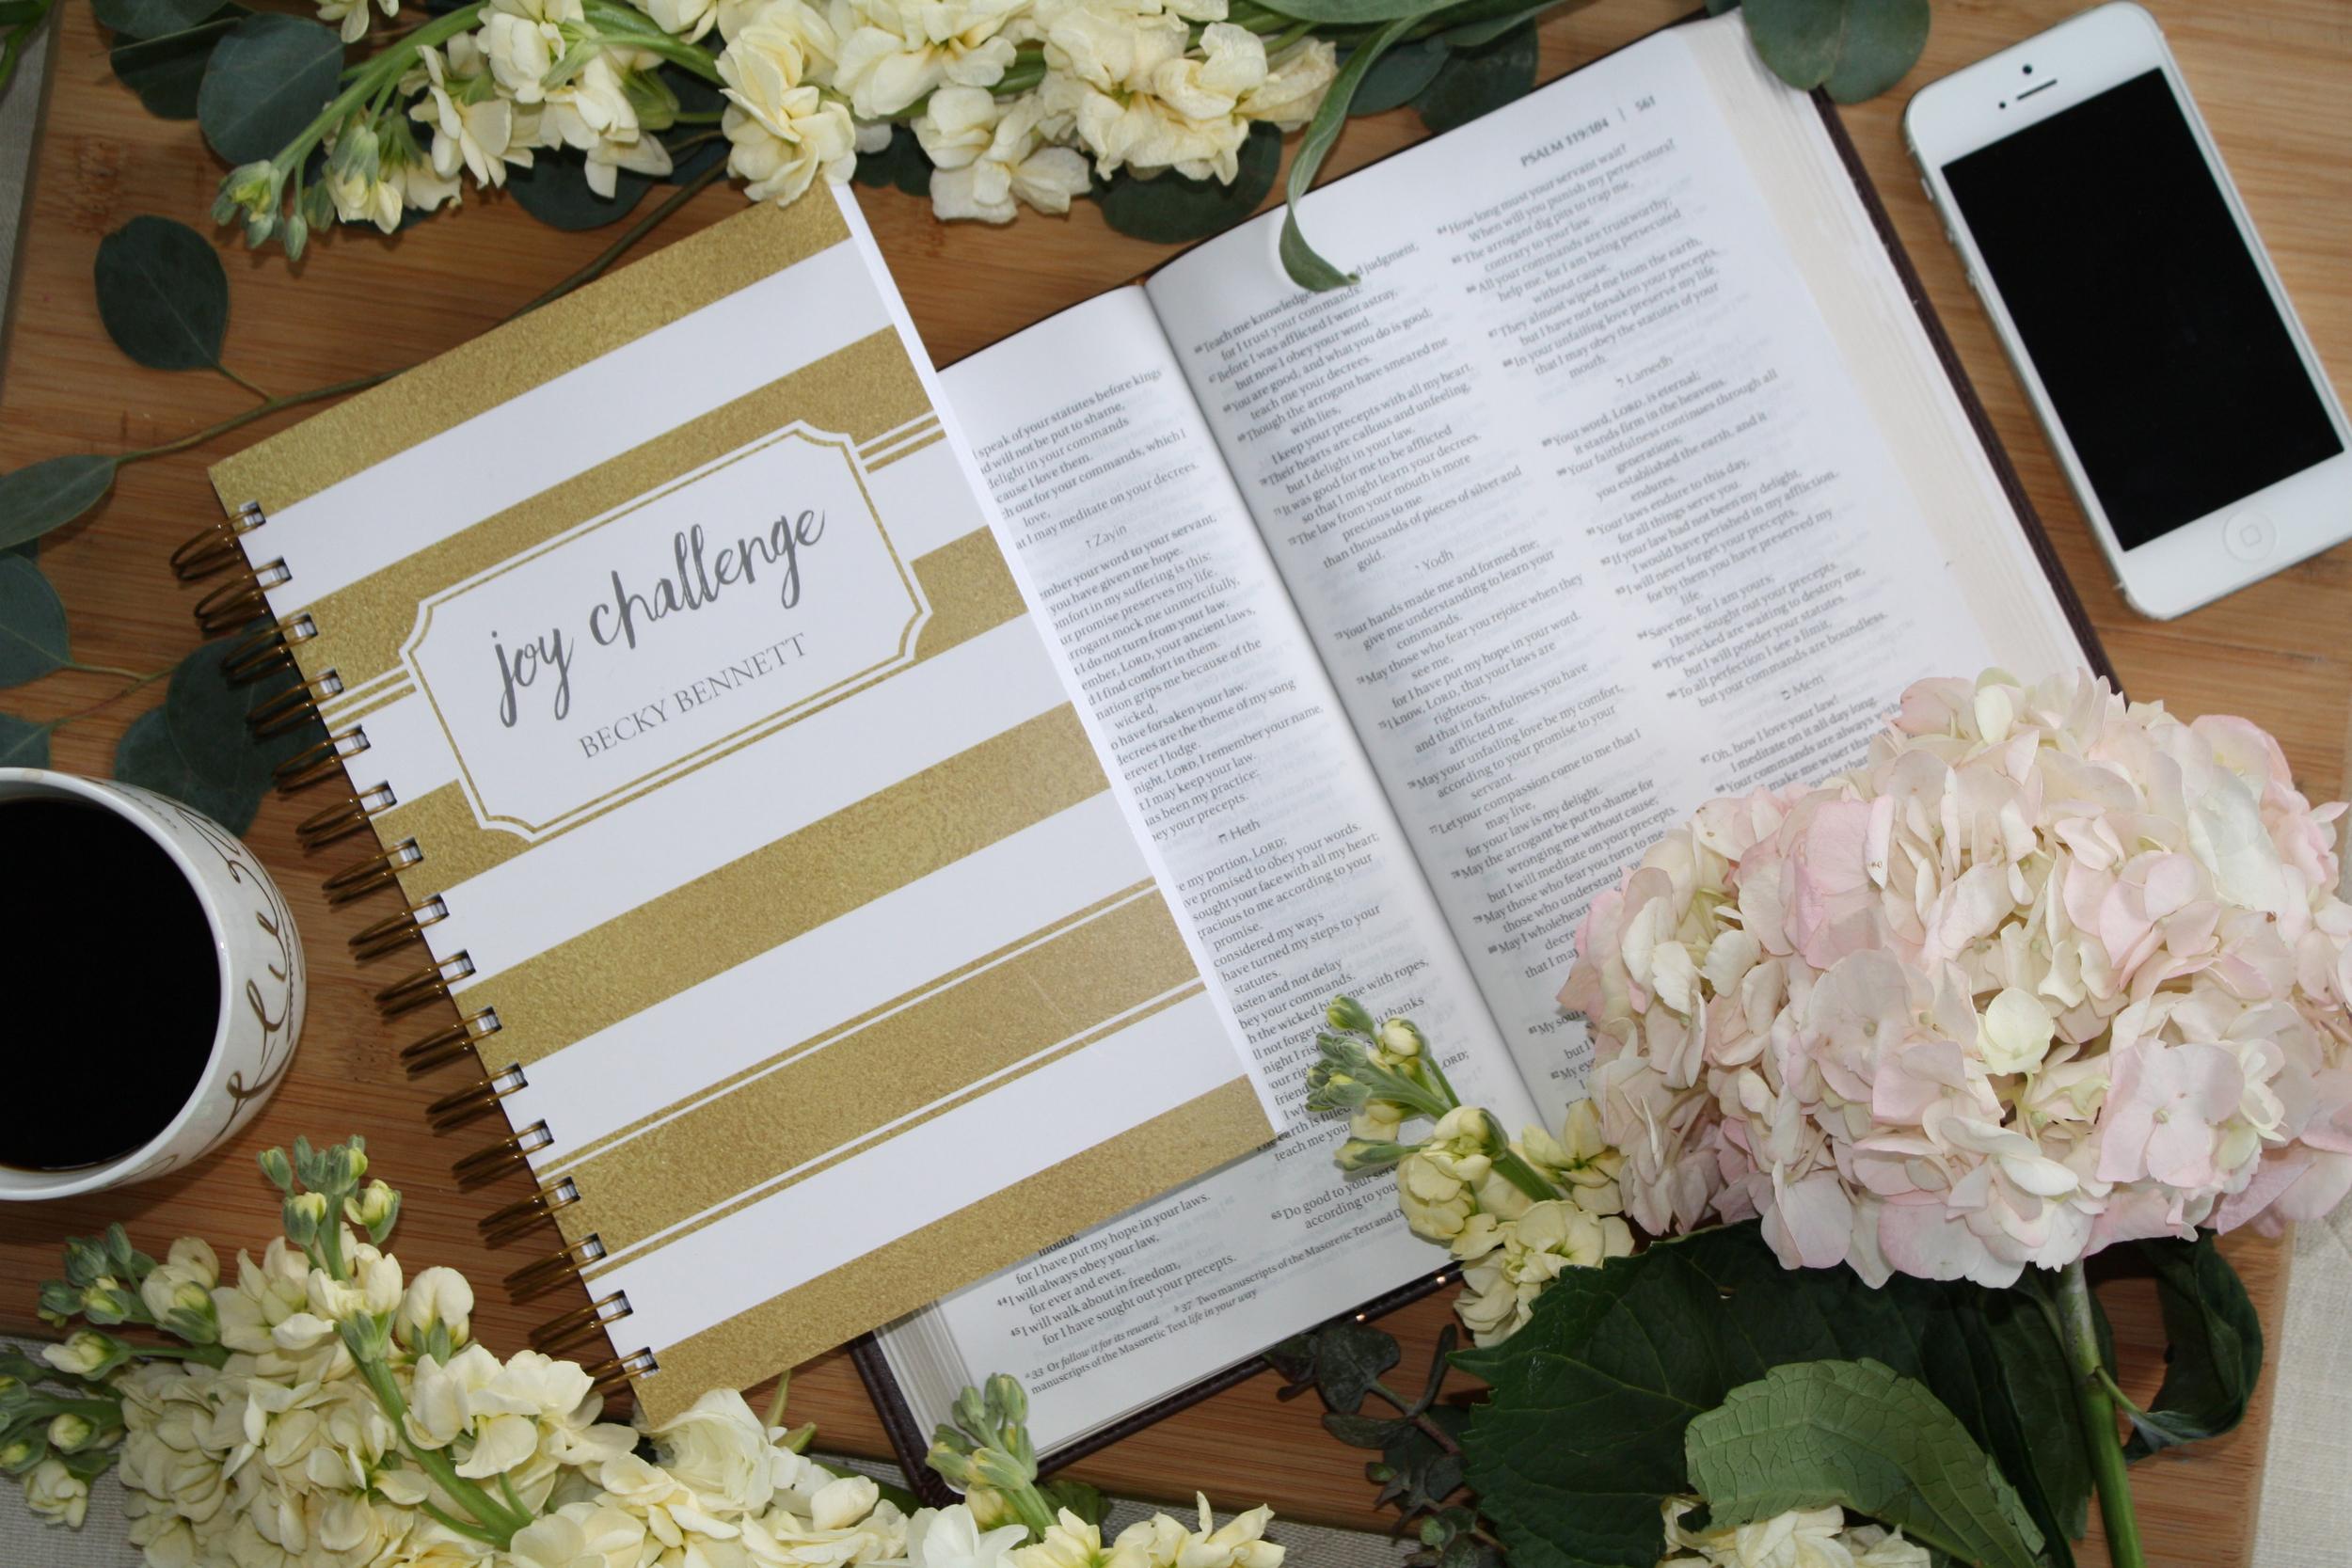 To Choose Joy_Becky Bennett_Joy Challenge_Bible Study_Devotional Journal